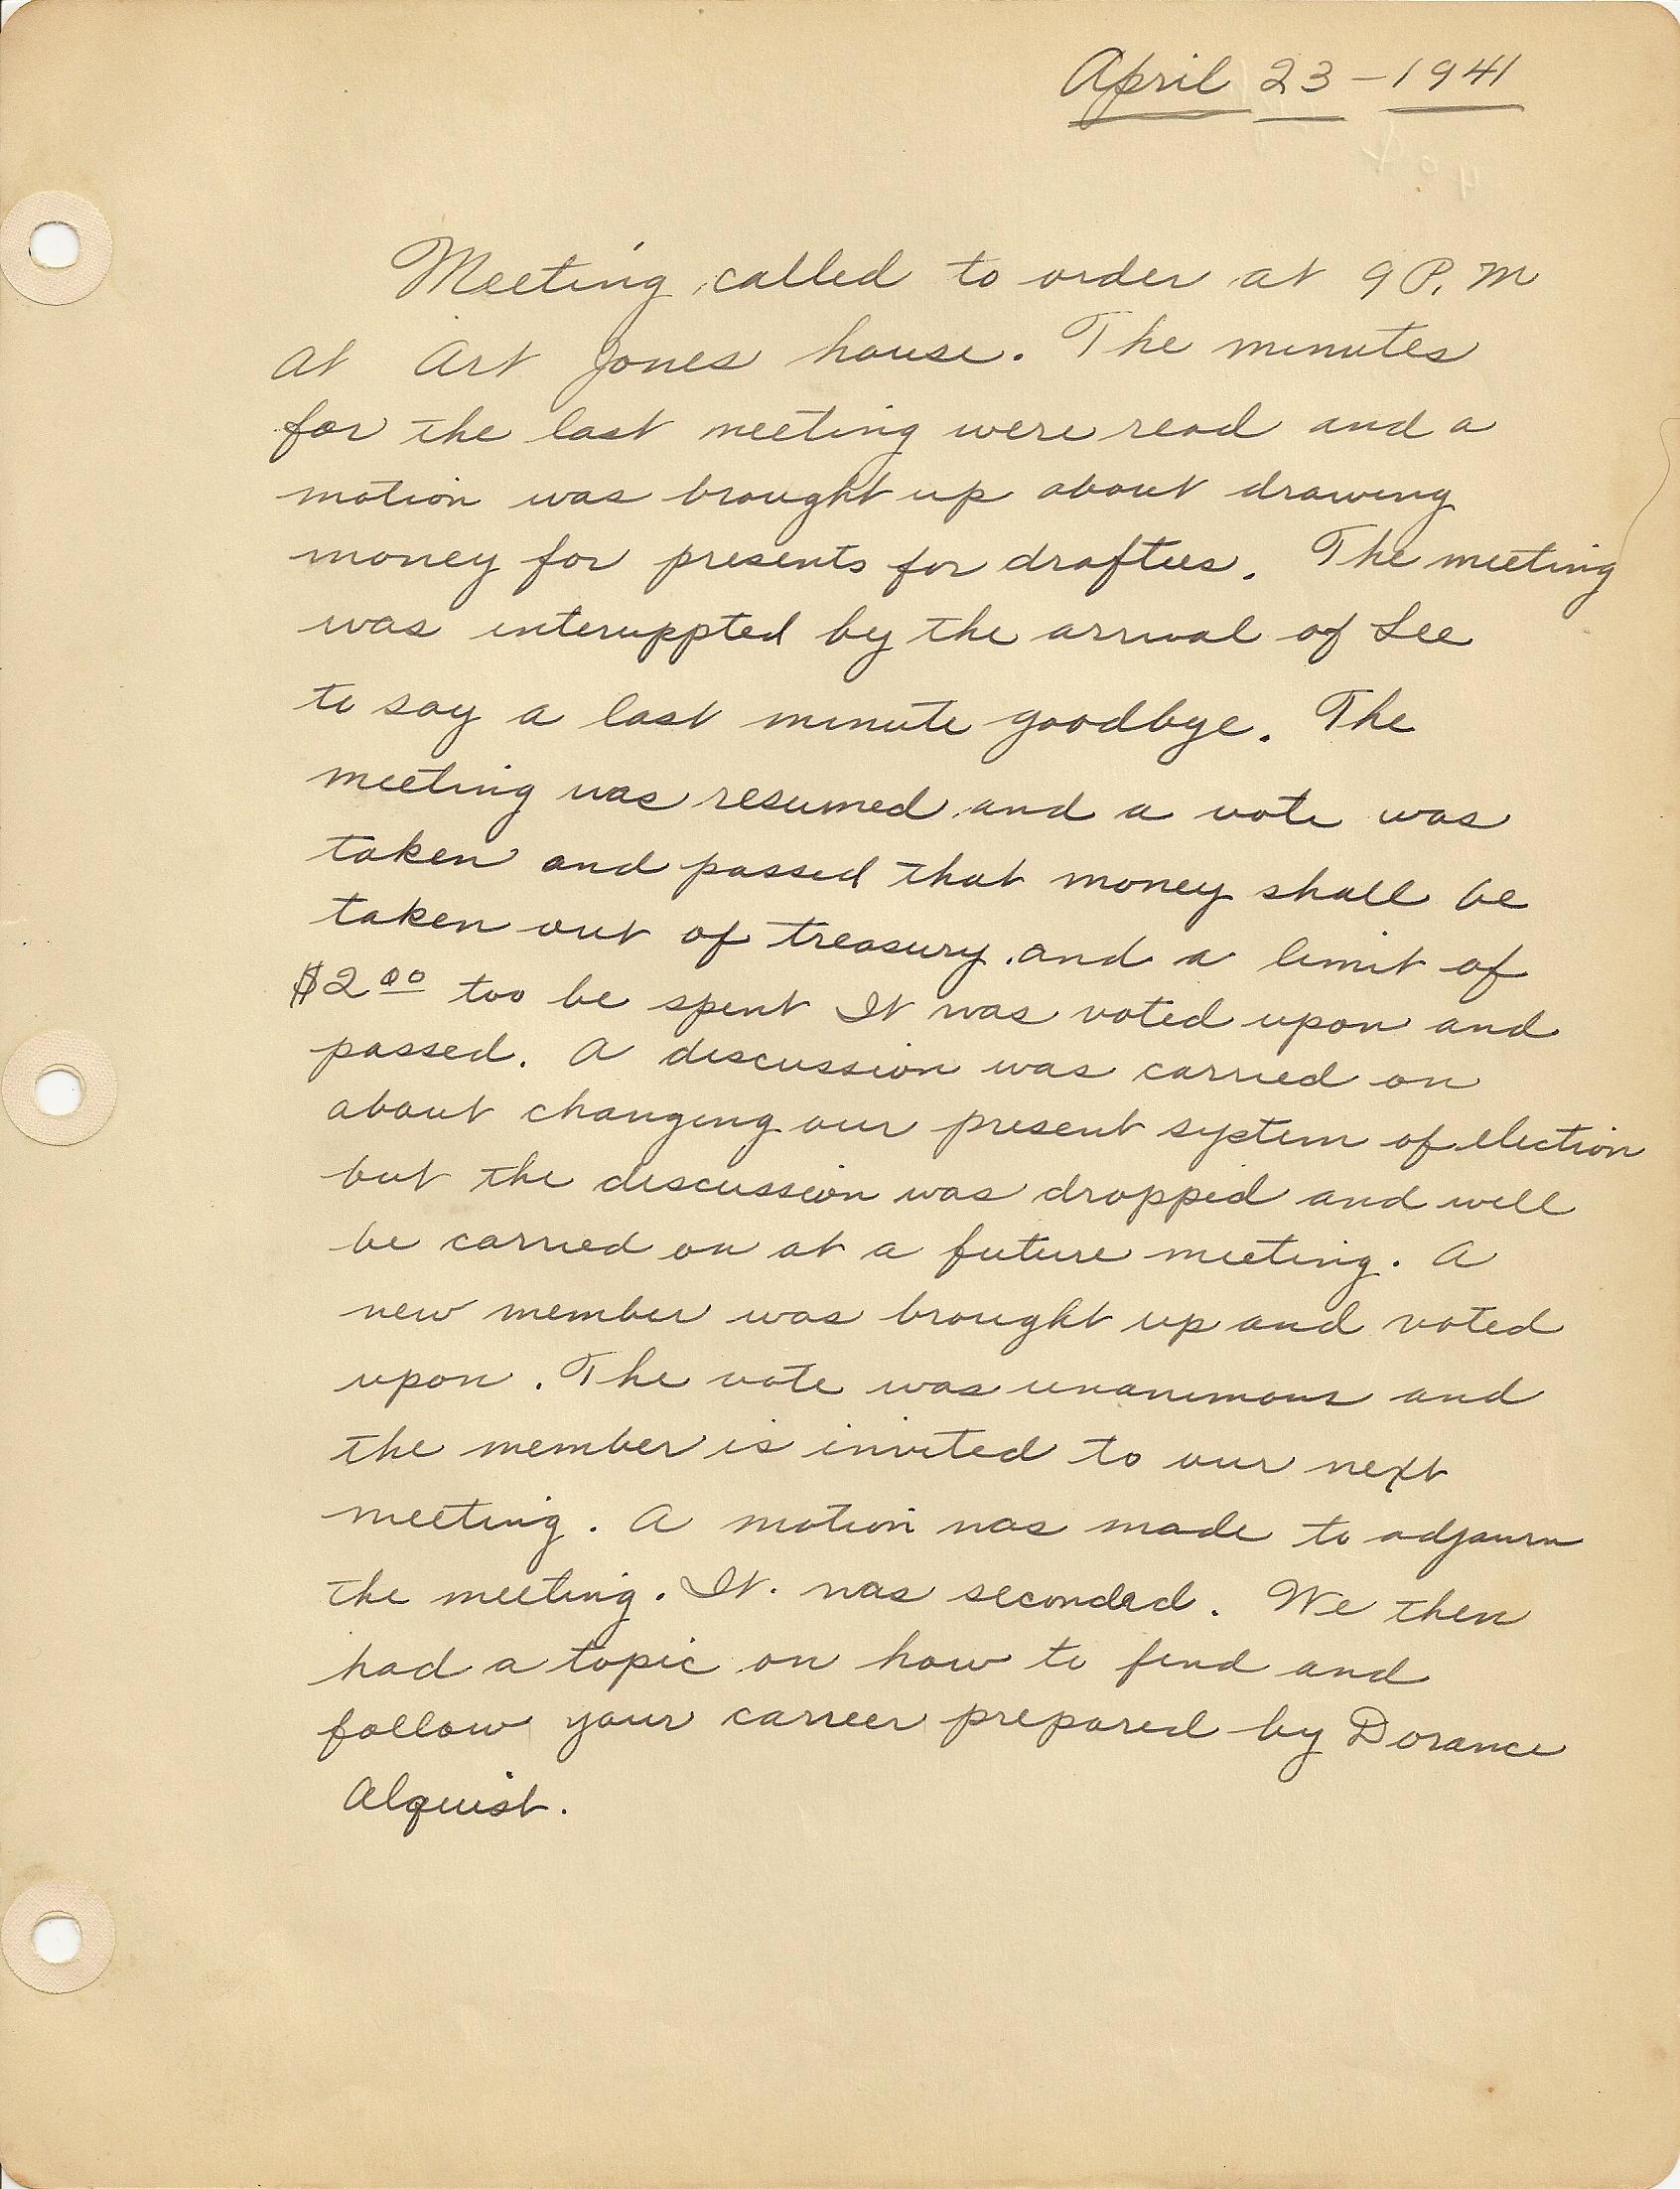 Minutes 4.23.1941.jpg